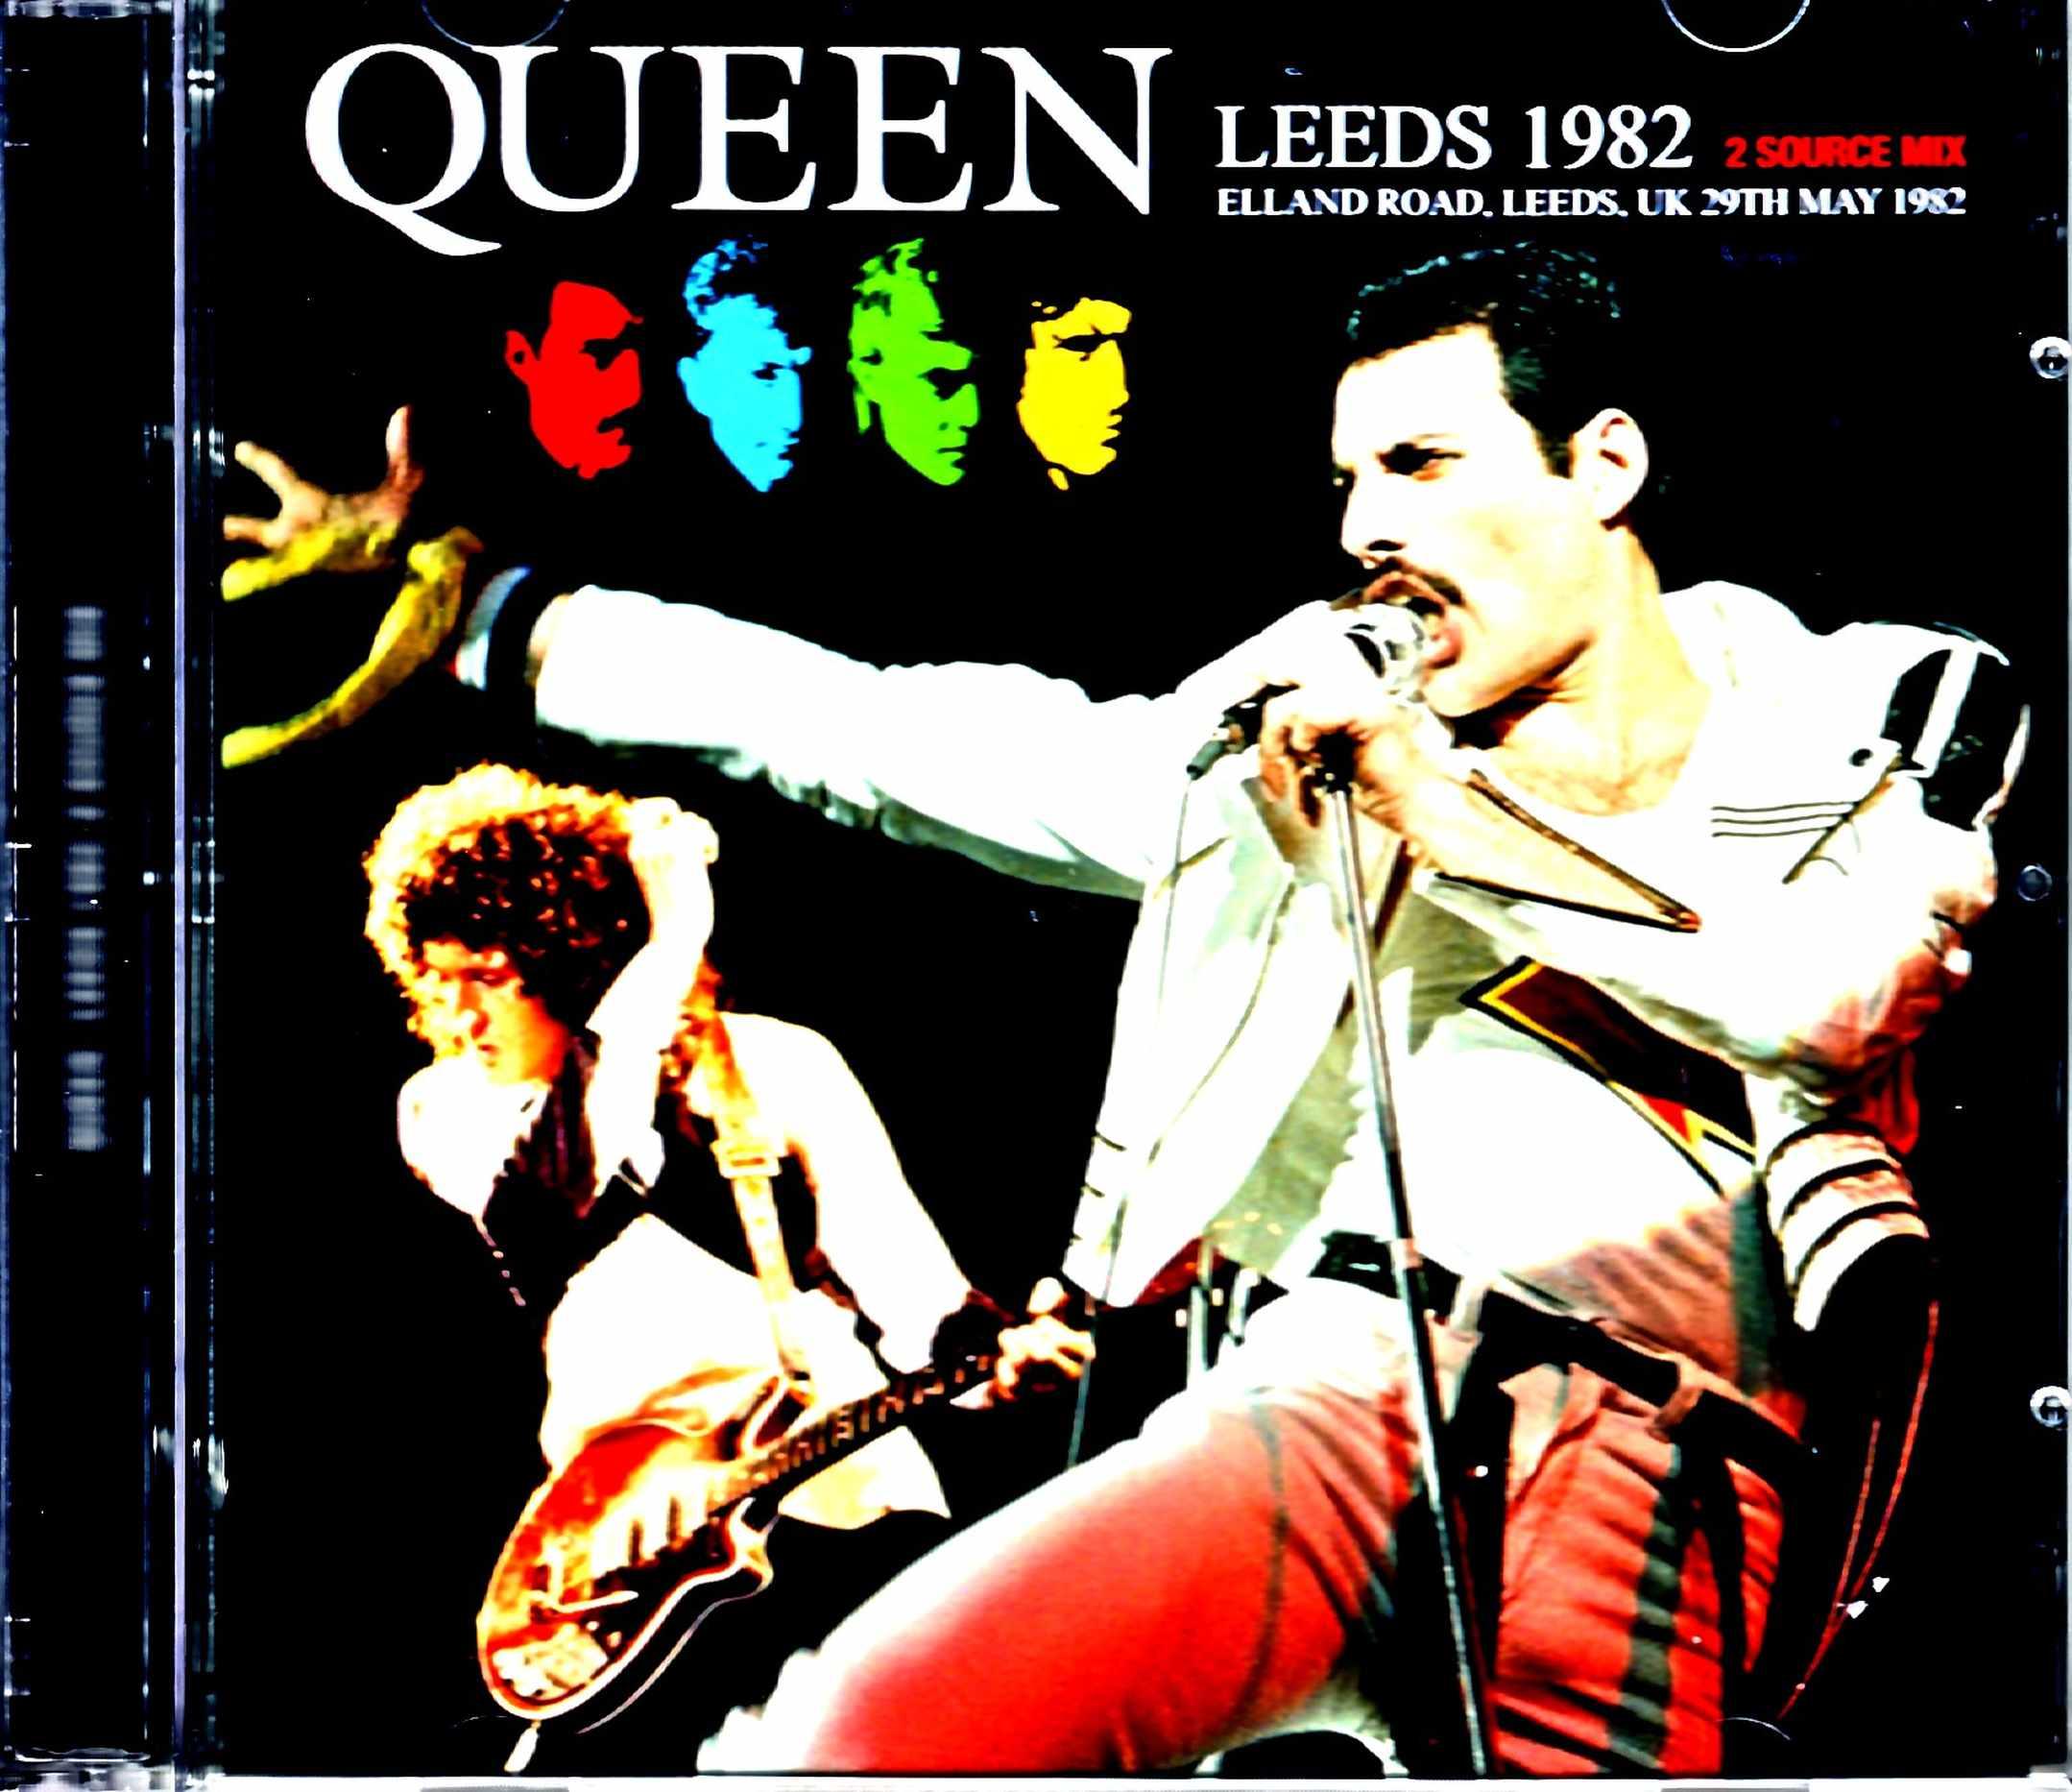 Queen クィーン/England,UK 1982 2Source Mix